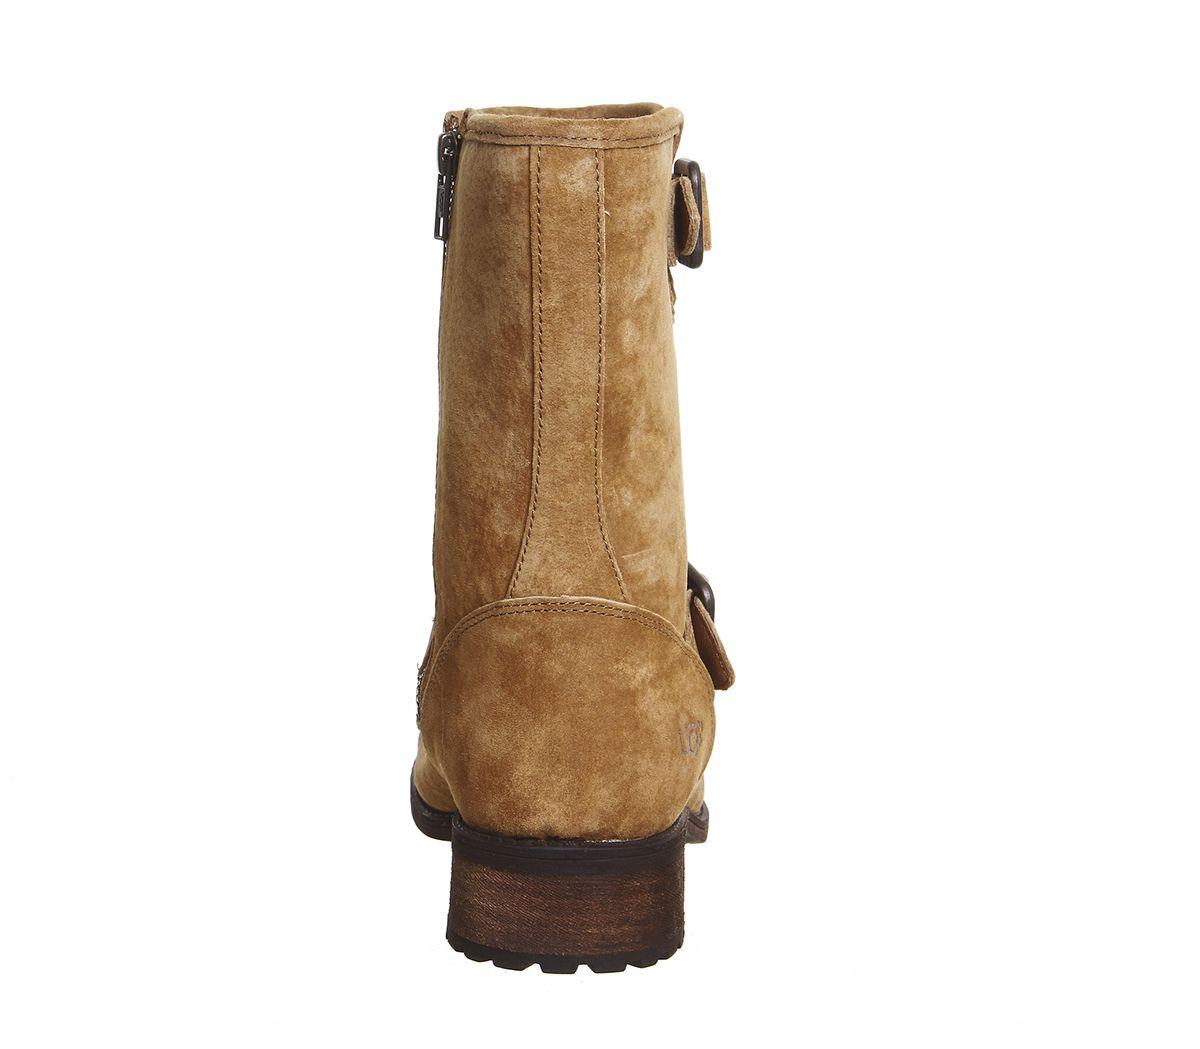 78541ba6ba3 Chaney Buckle Boots